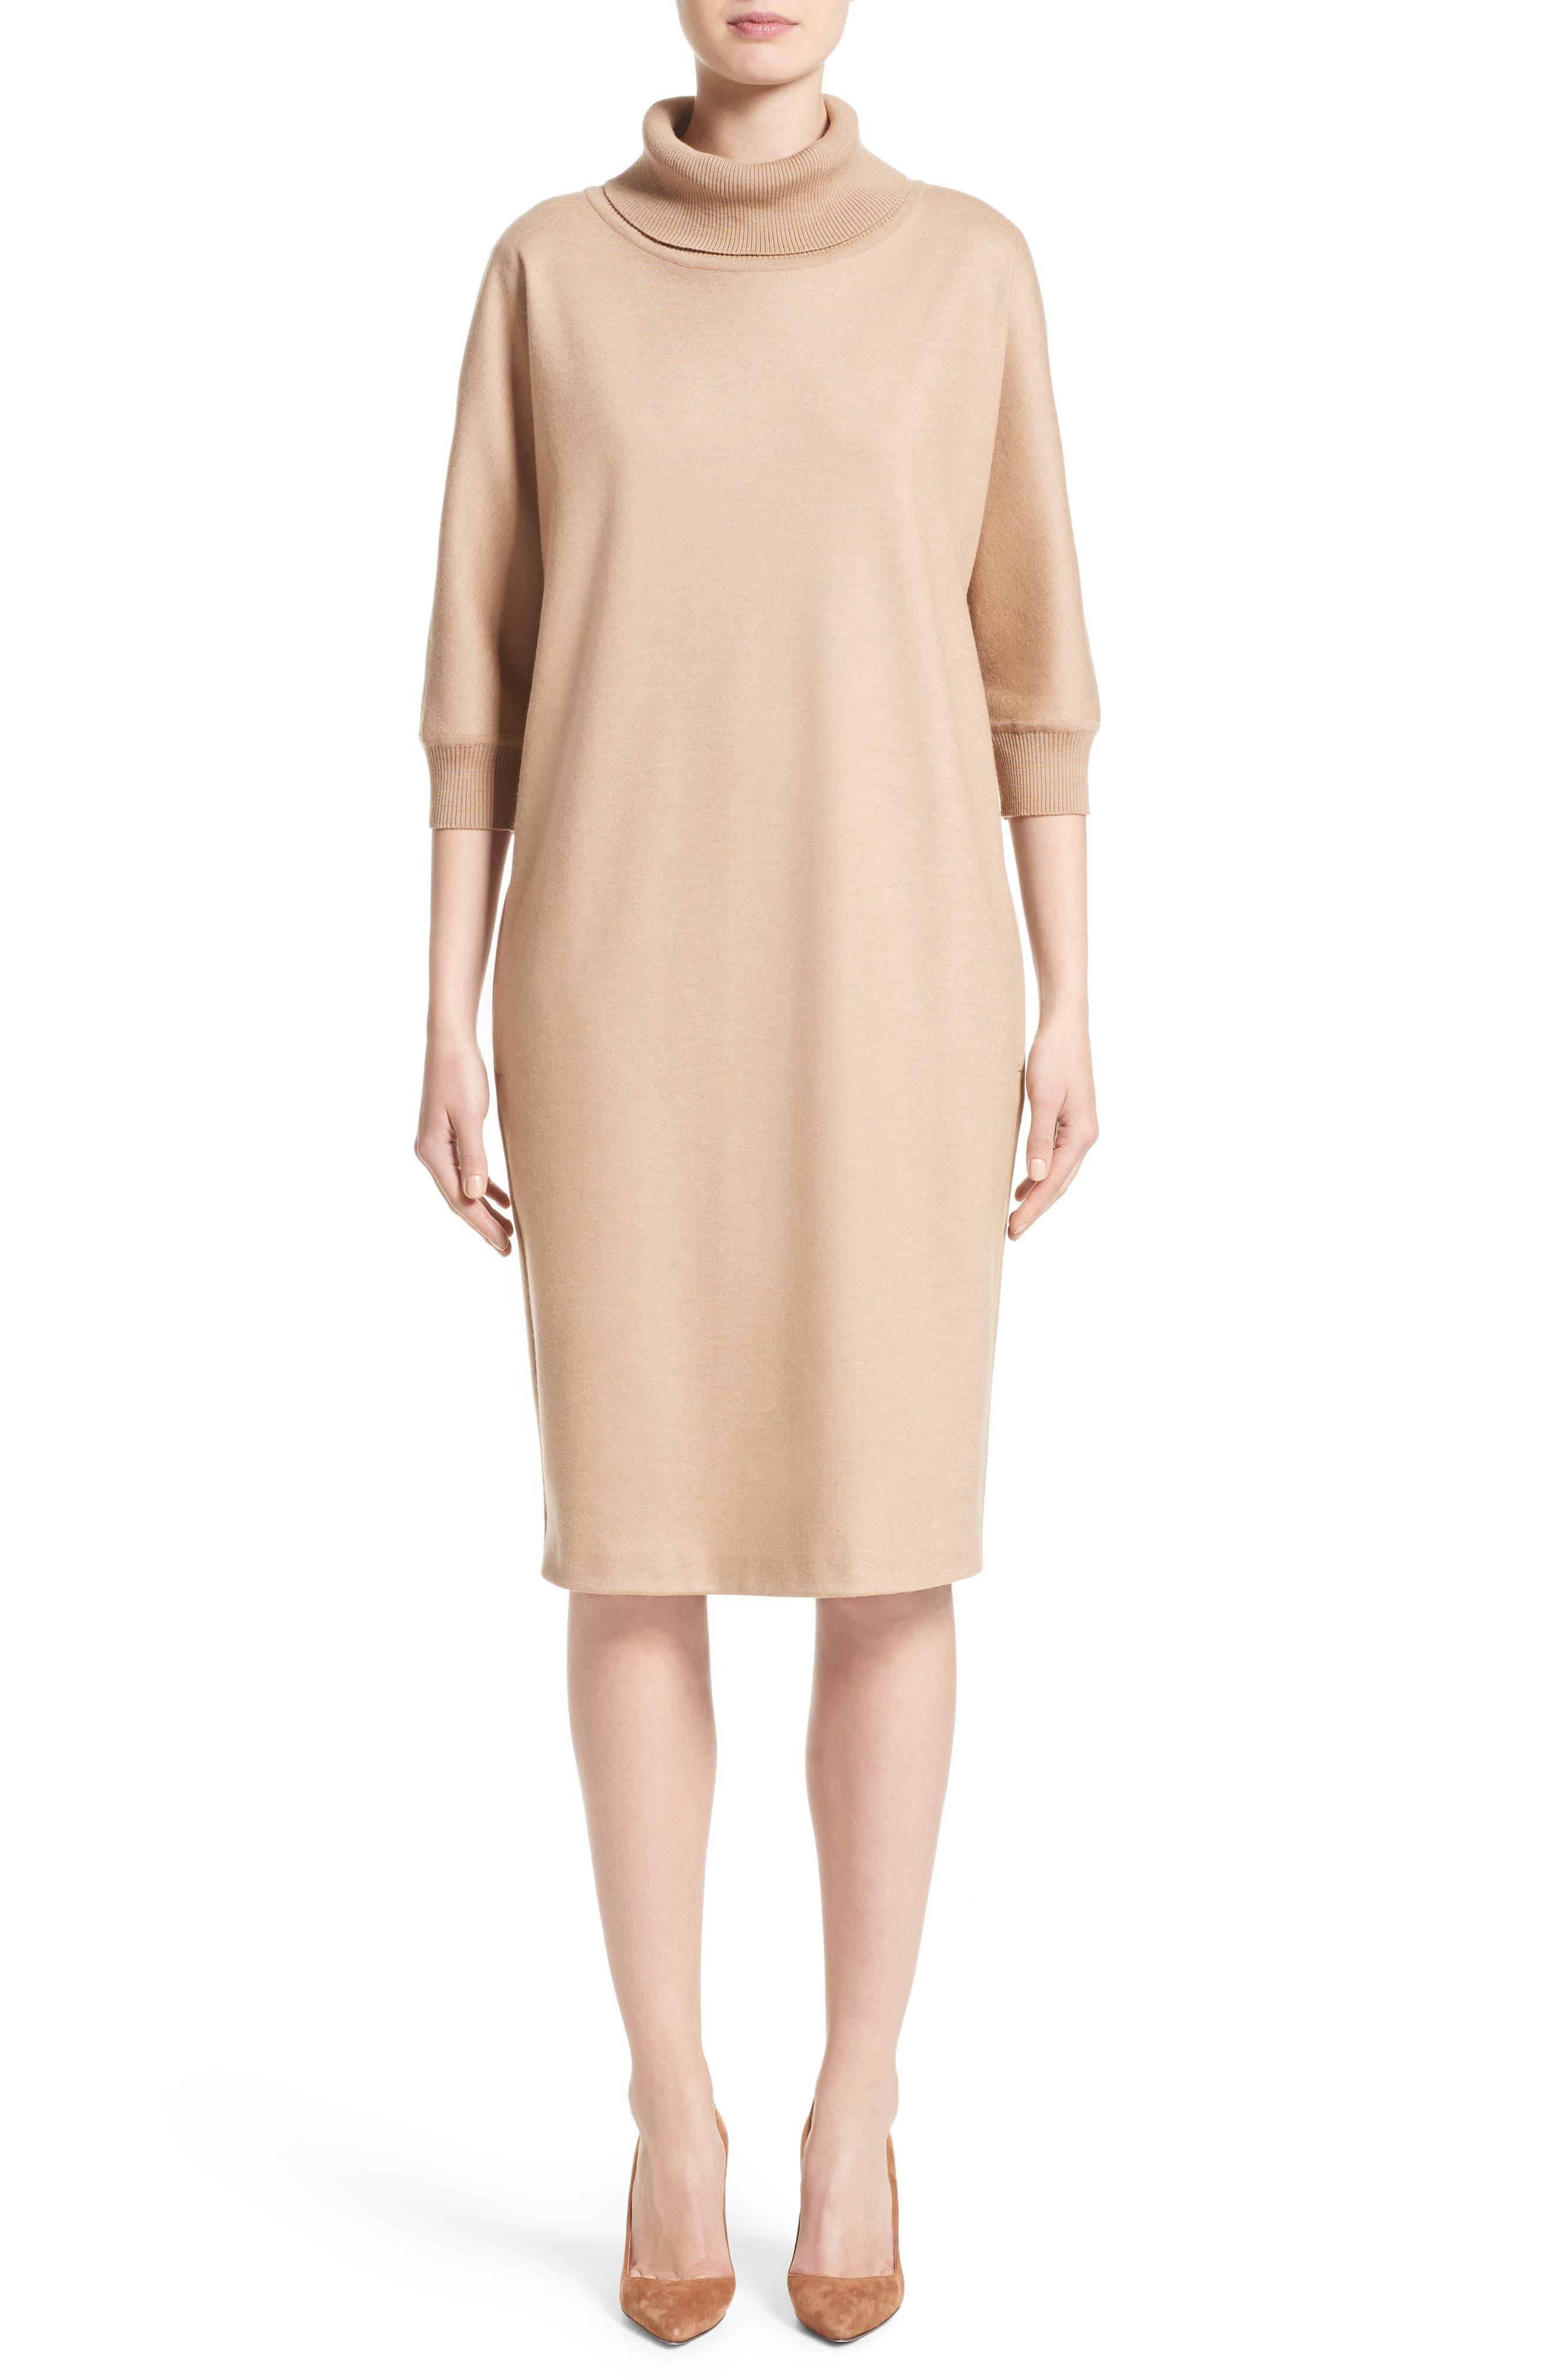 Agro Wool Turtleneck Dress,                         Main,                         color, 232